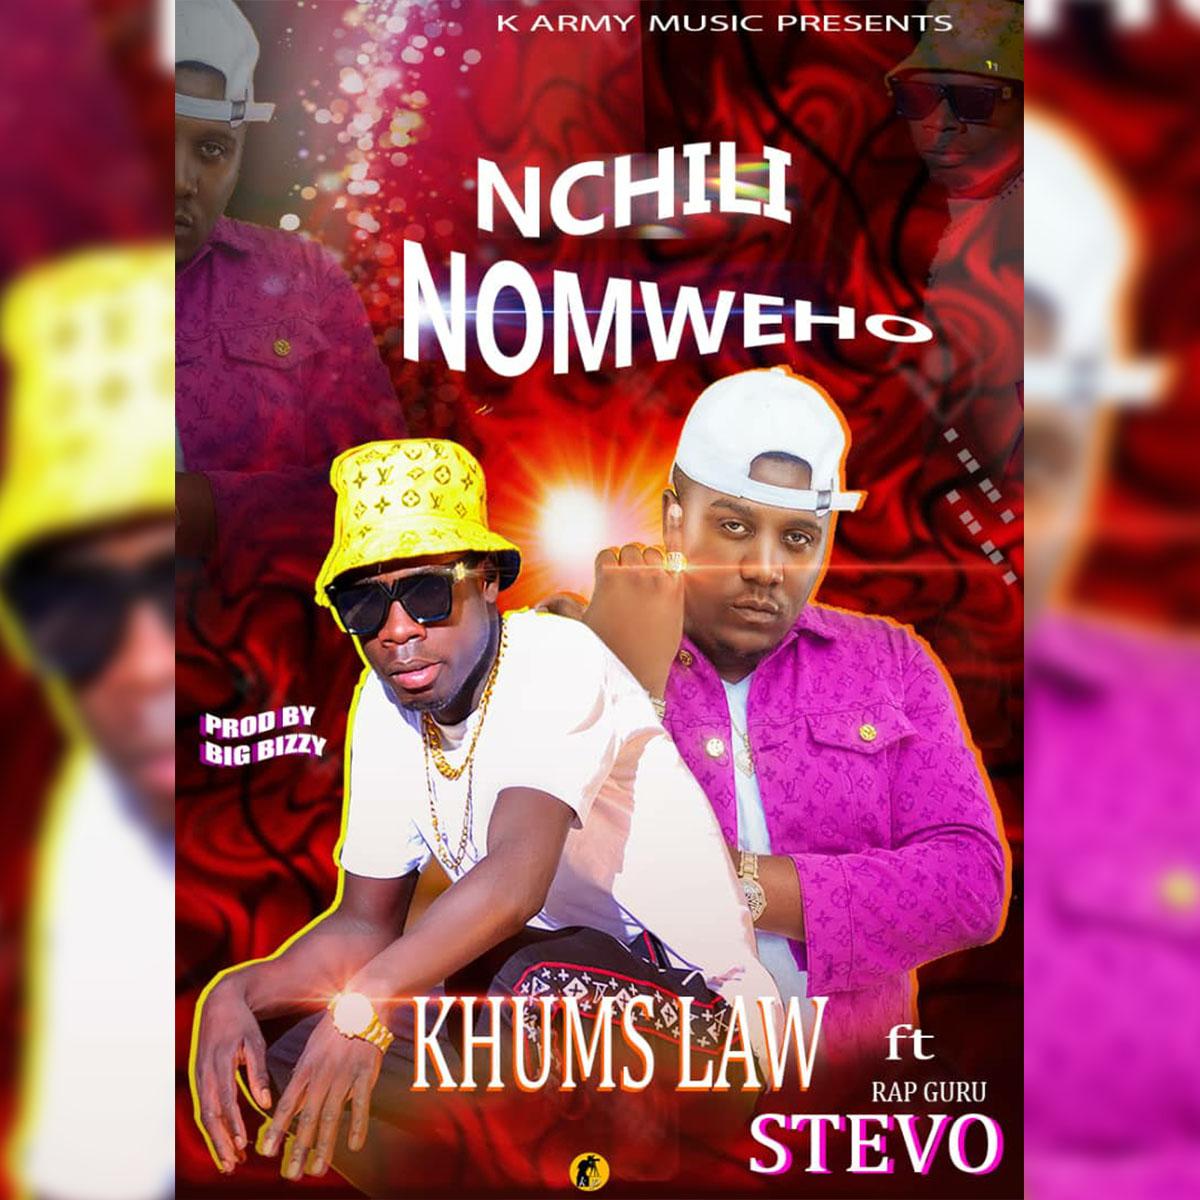 Khums Law ft. Stevo - Nchili Nomweo